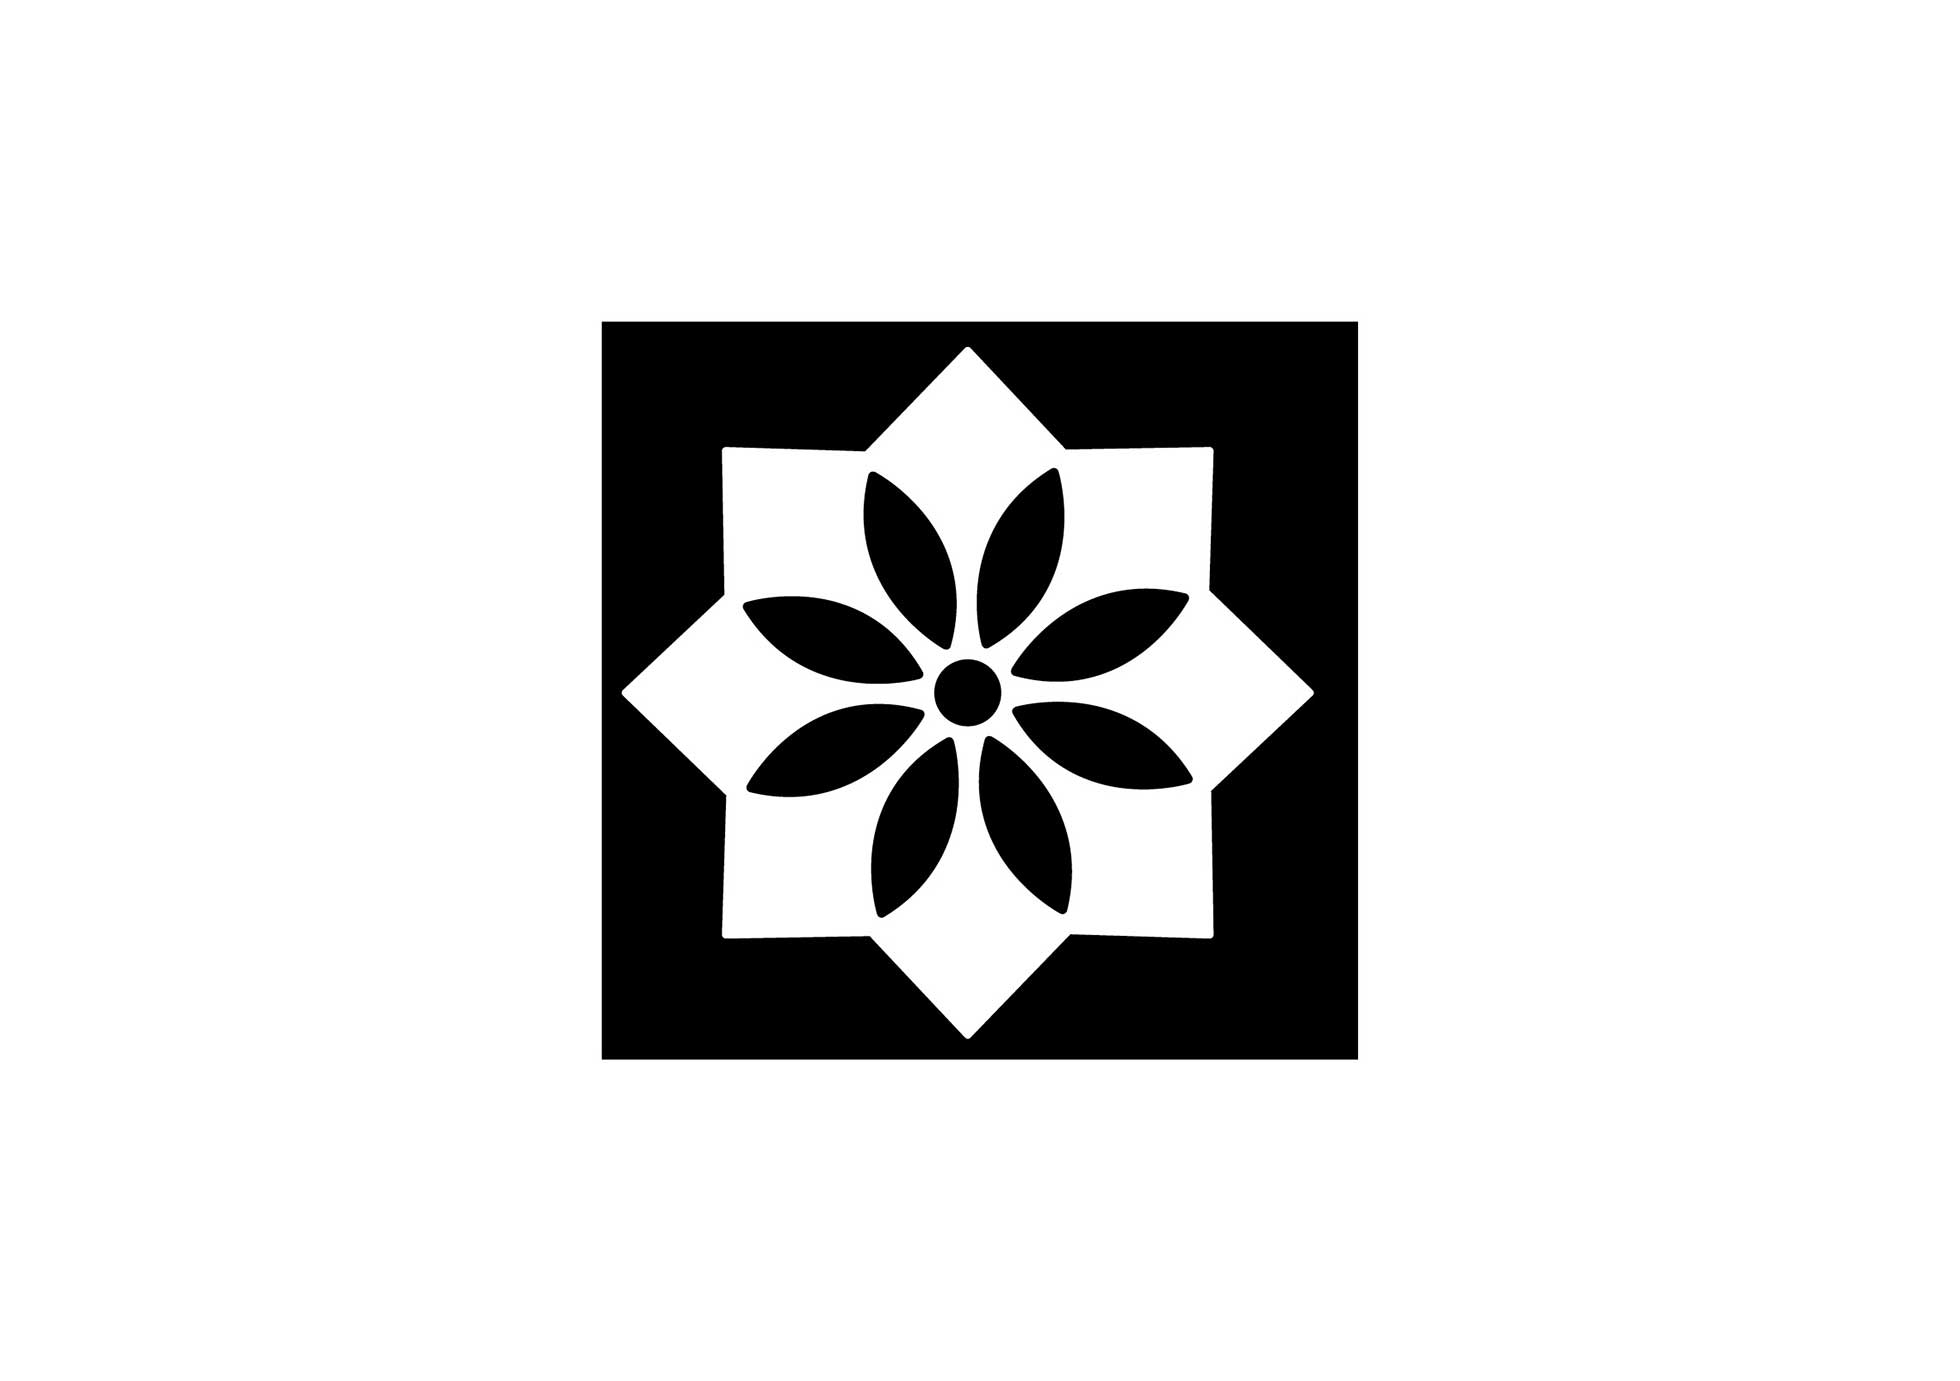 Šumavská XIII logo